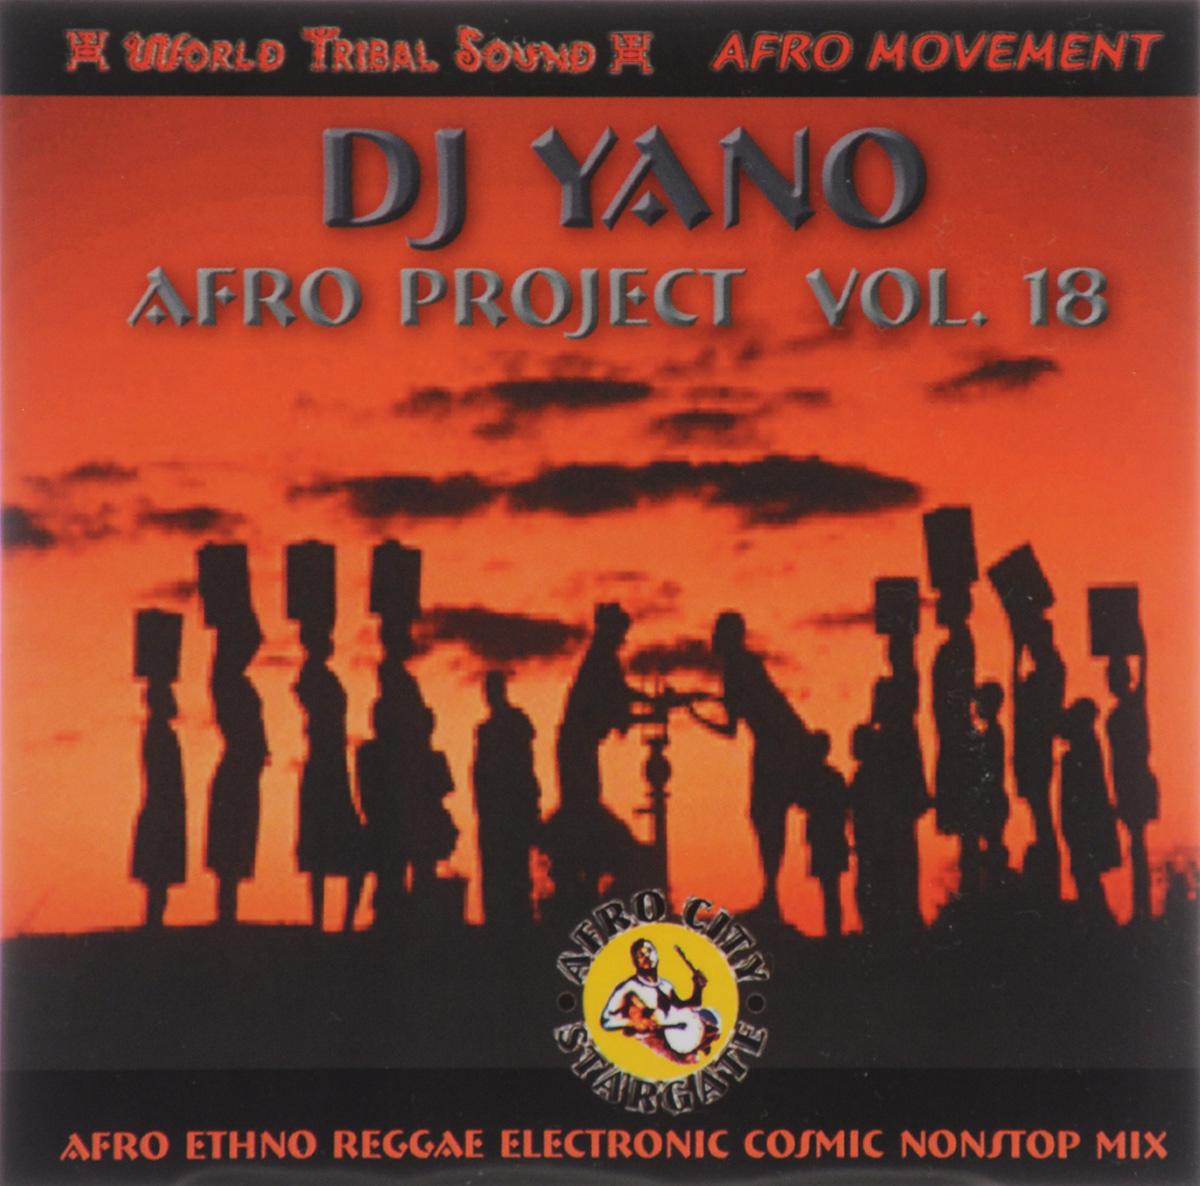 цена на Dj Yano,Stefan Egger / DJ Stefan Egger,Tosi Brandi,El Rookie,Pancho,Obrint Pass,Mauri,Kuma,Maridosa,Chiclete Dj Yano. Afro Project. Vol. 18